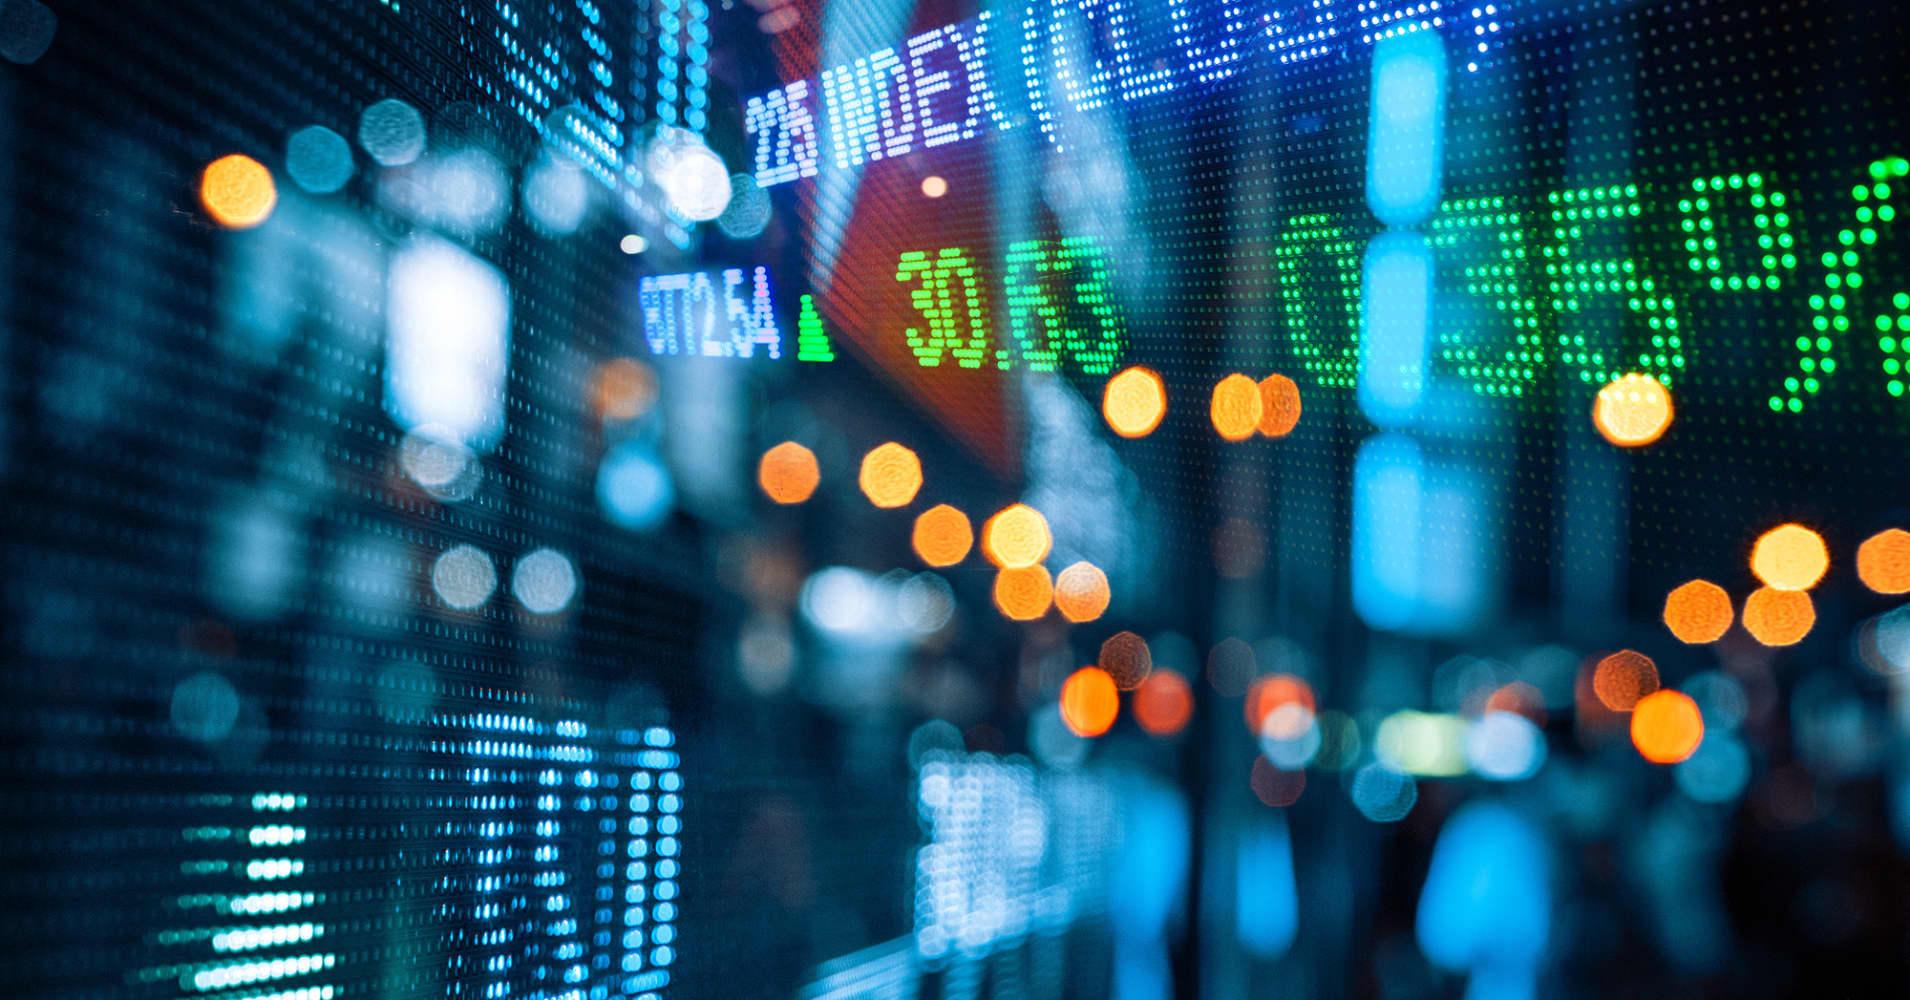 European markets slip amid fears of global growth slowdown; UK retailer Asos down 36%